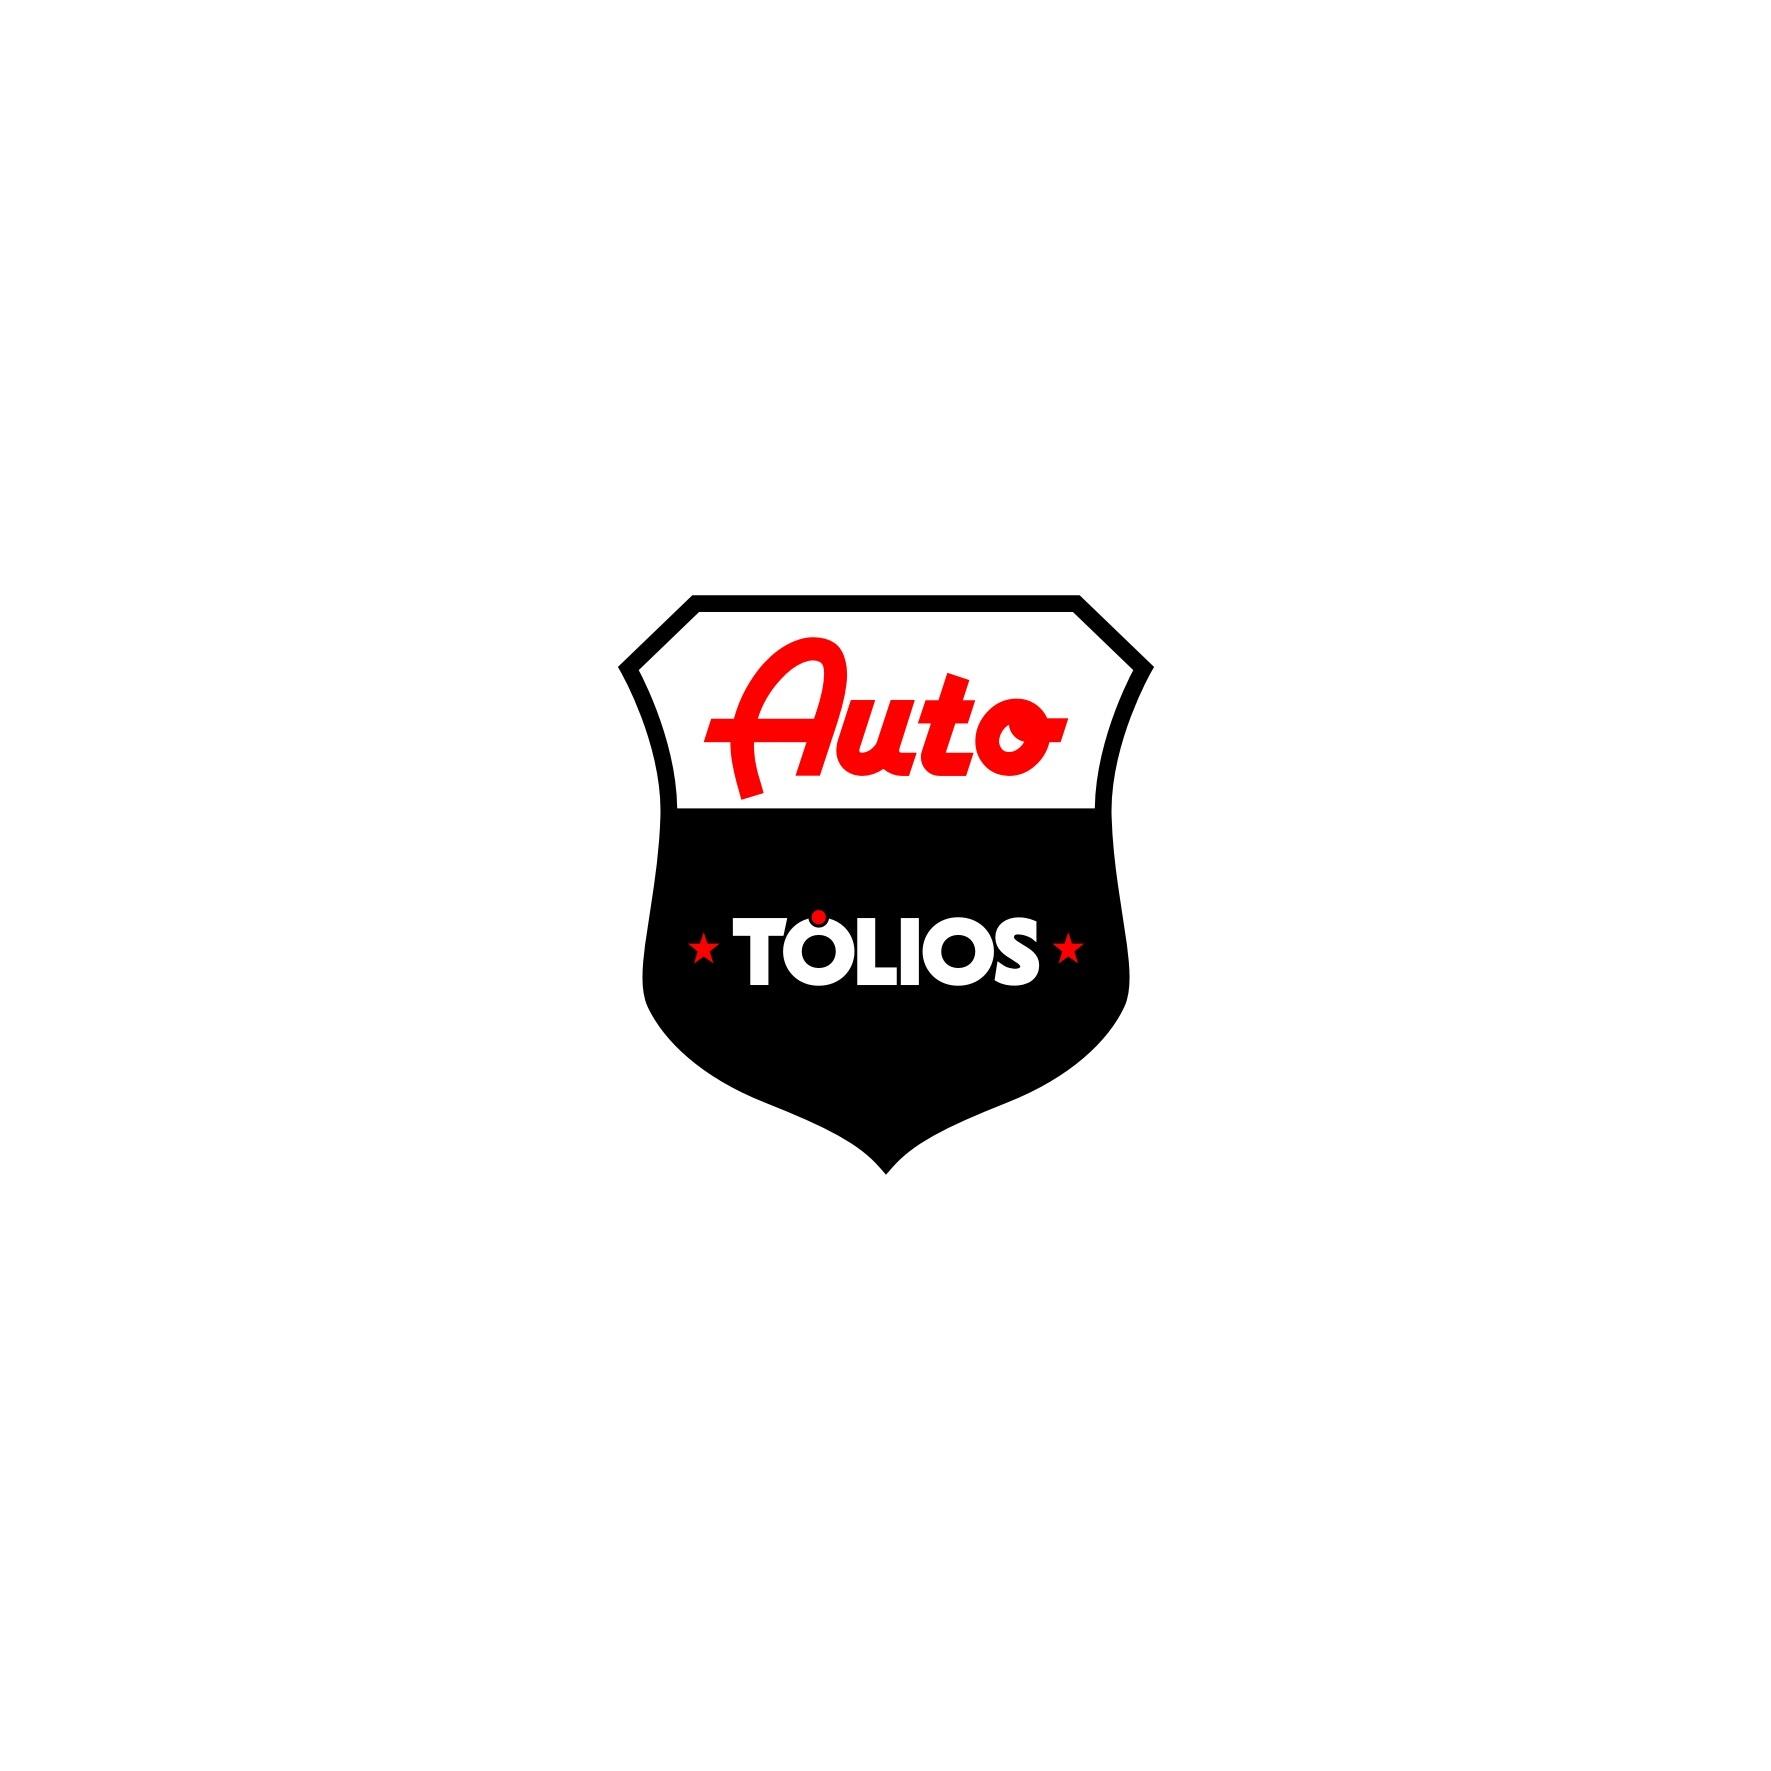 https://0501.nccdn.net/4_2/000/000/08b/2f1/tolios_by_koukida-1771x1771.jpg